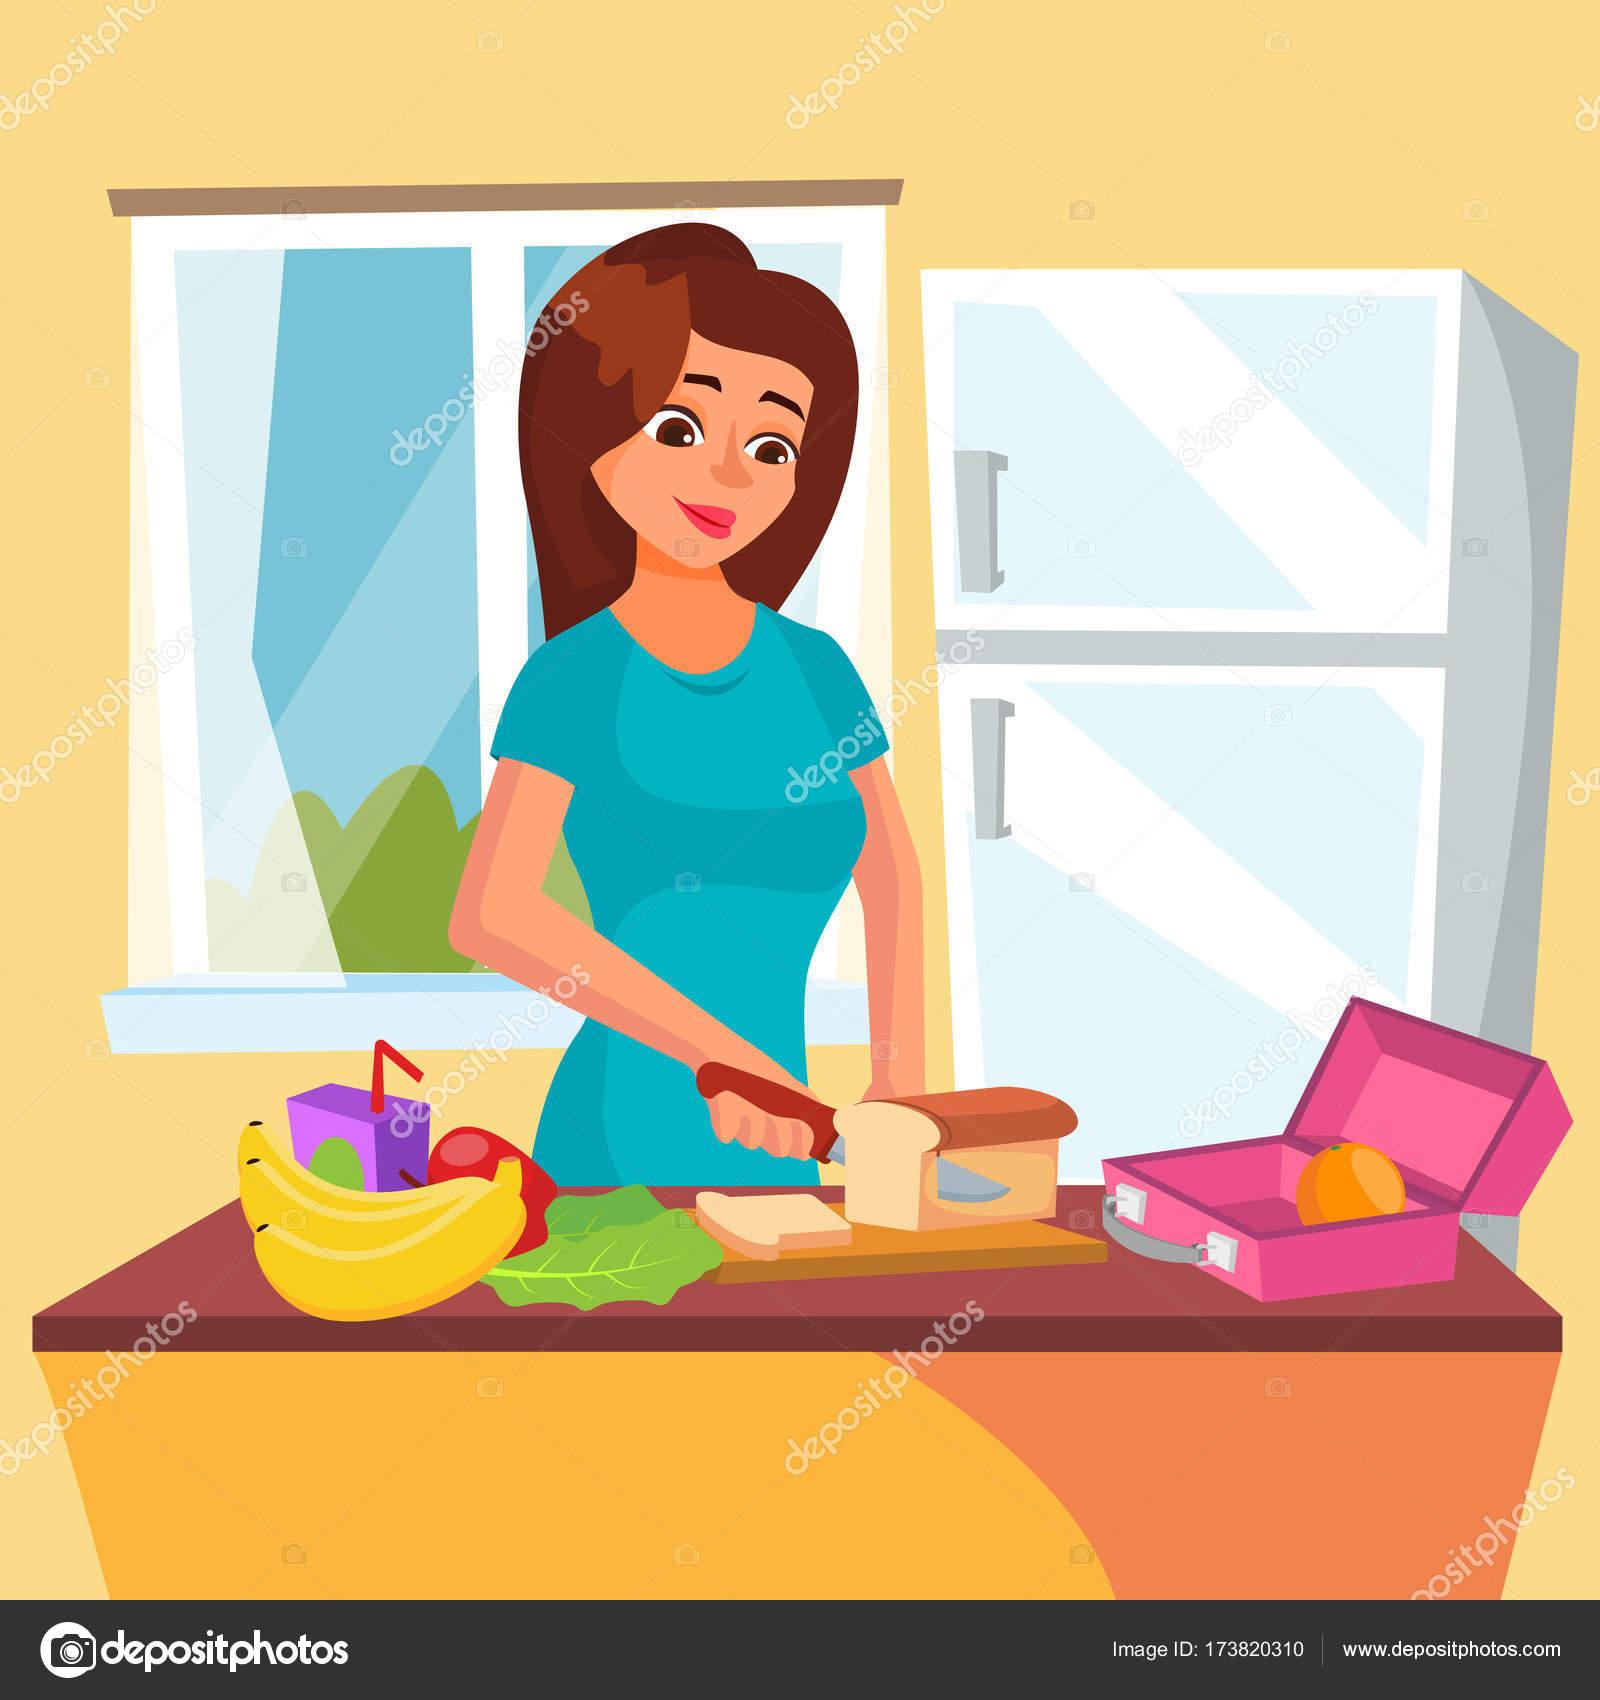 vector de caja de almuerzo caja de almuerzo cl u00e1sico con cook clipart free cook clipart black and white